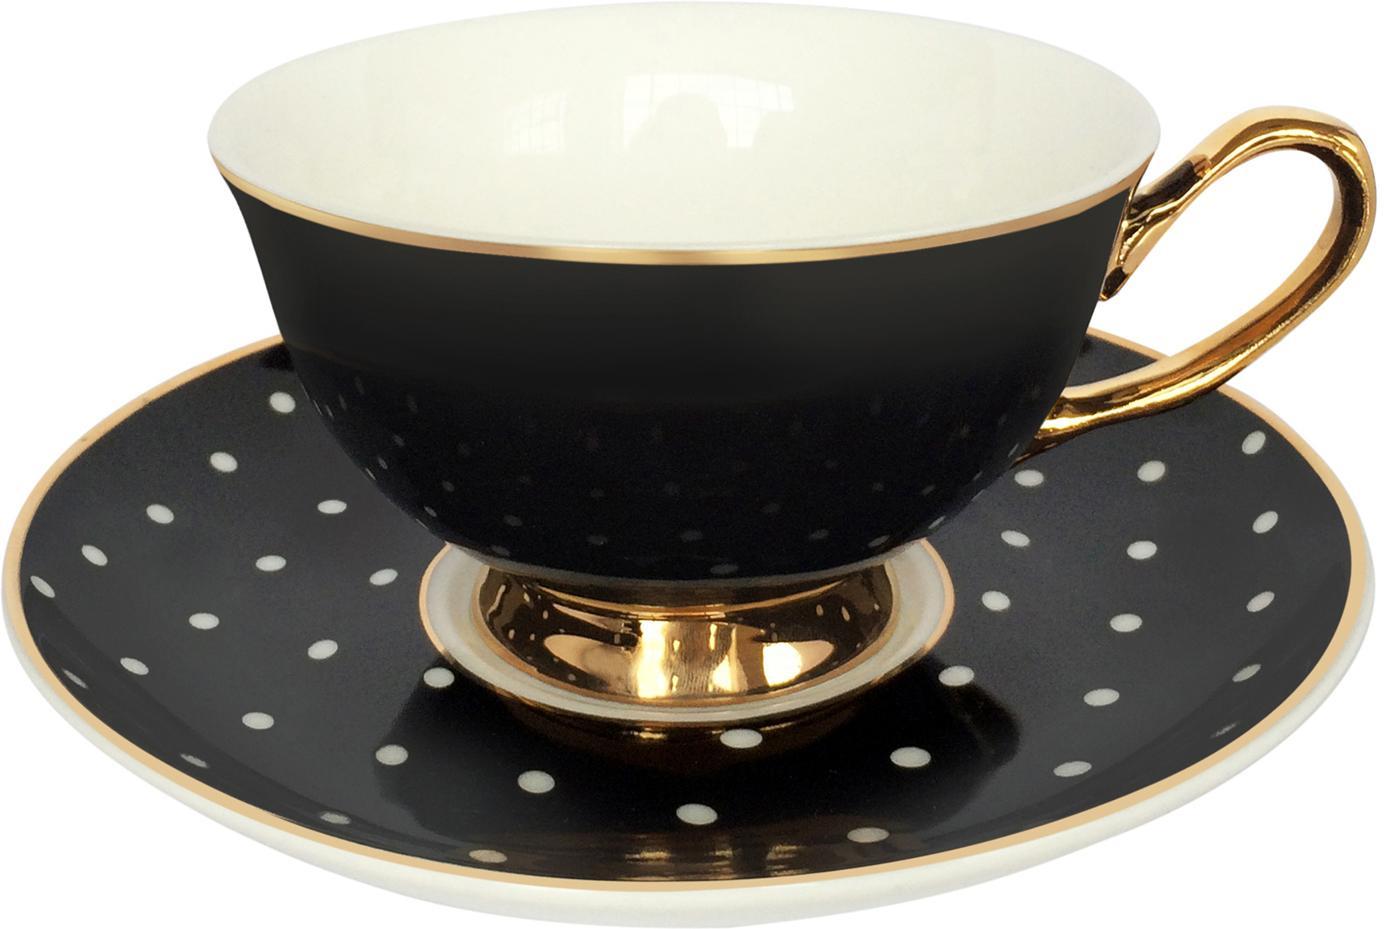 Taza de té con platillo Spotty, Porcelana fina, dorada, Negro, blanco Borde y asa: oro, Ø 15 x Al 6 cm